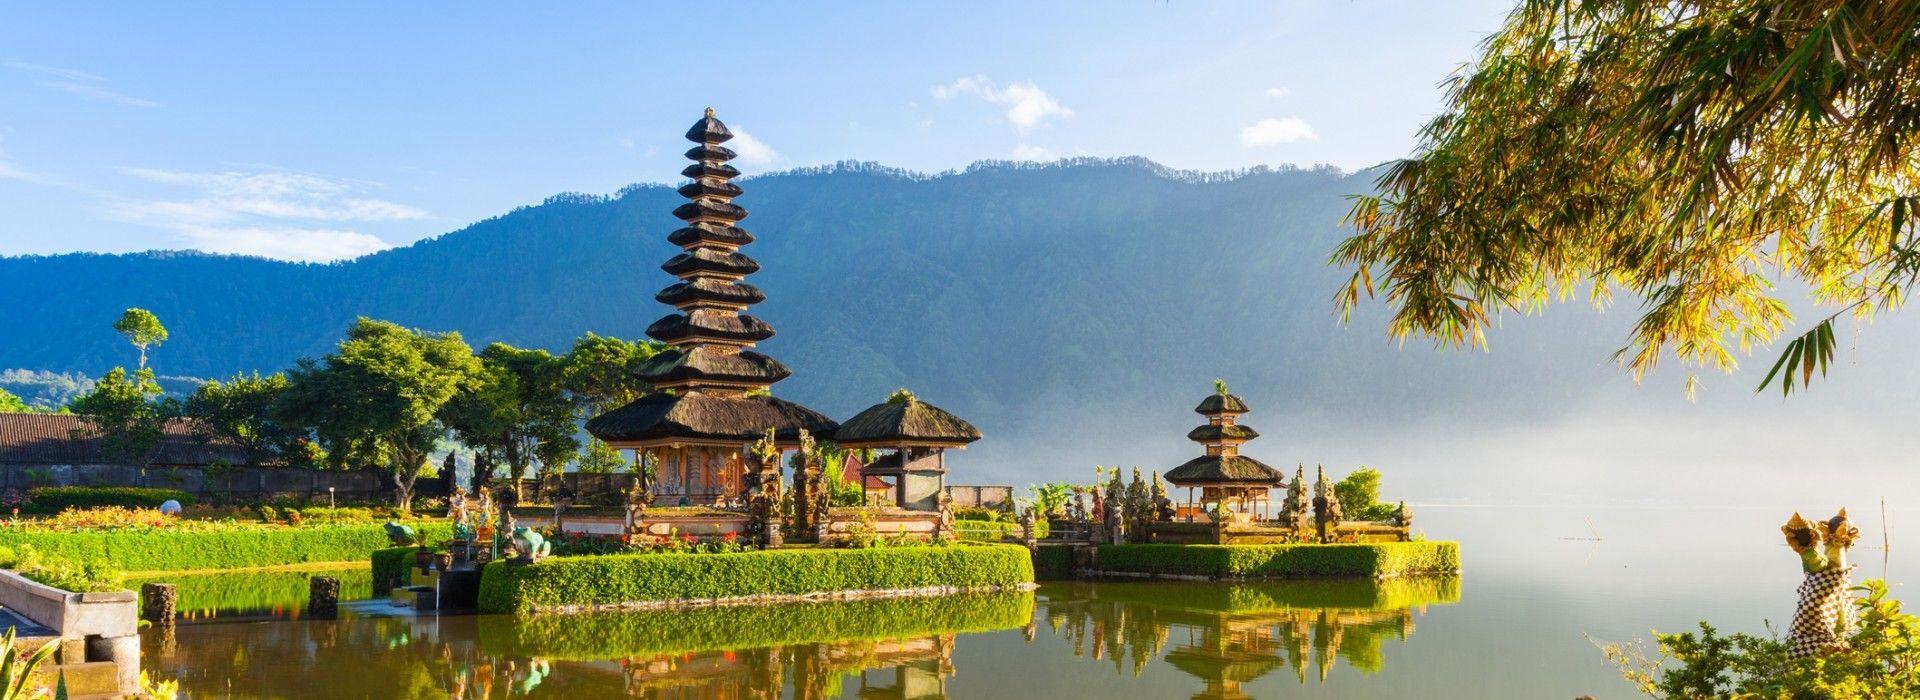 Trekking Tours in Bali